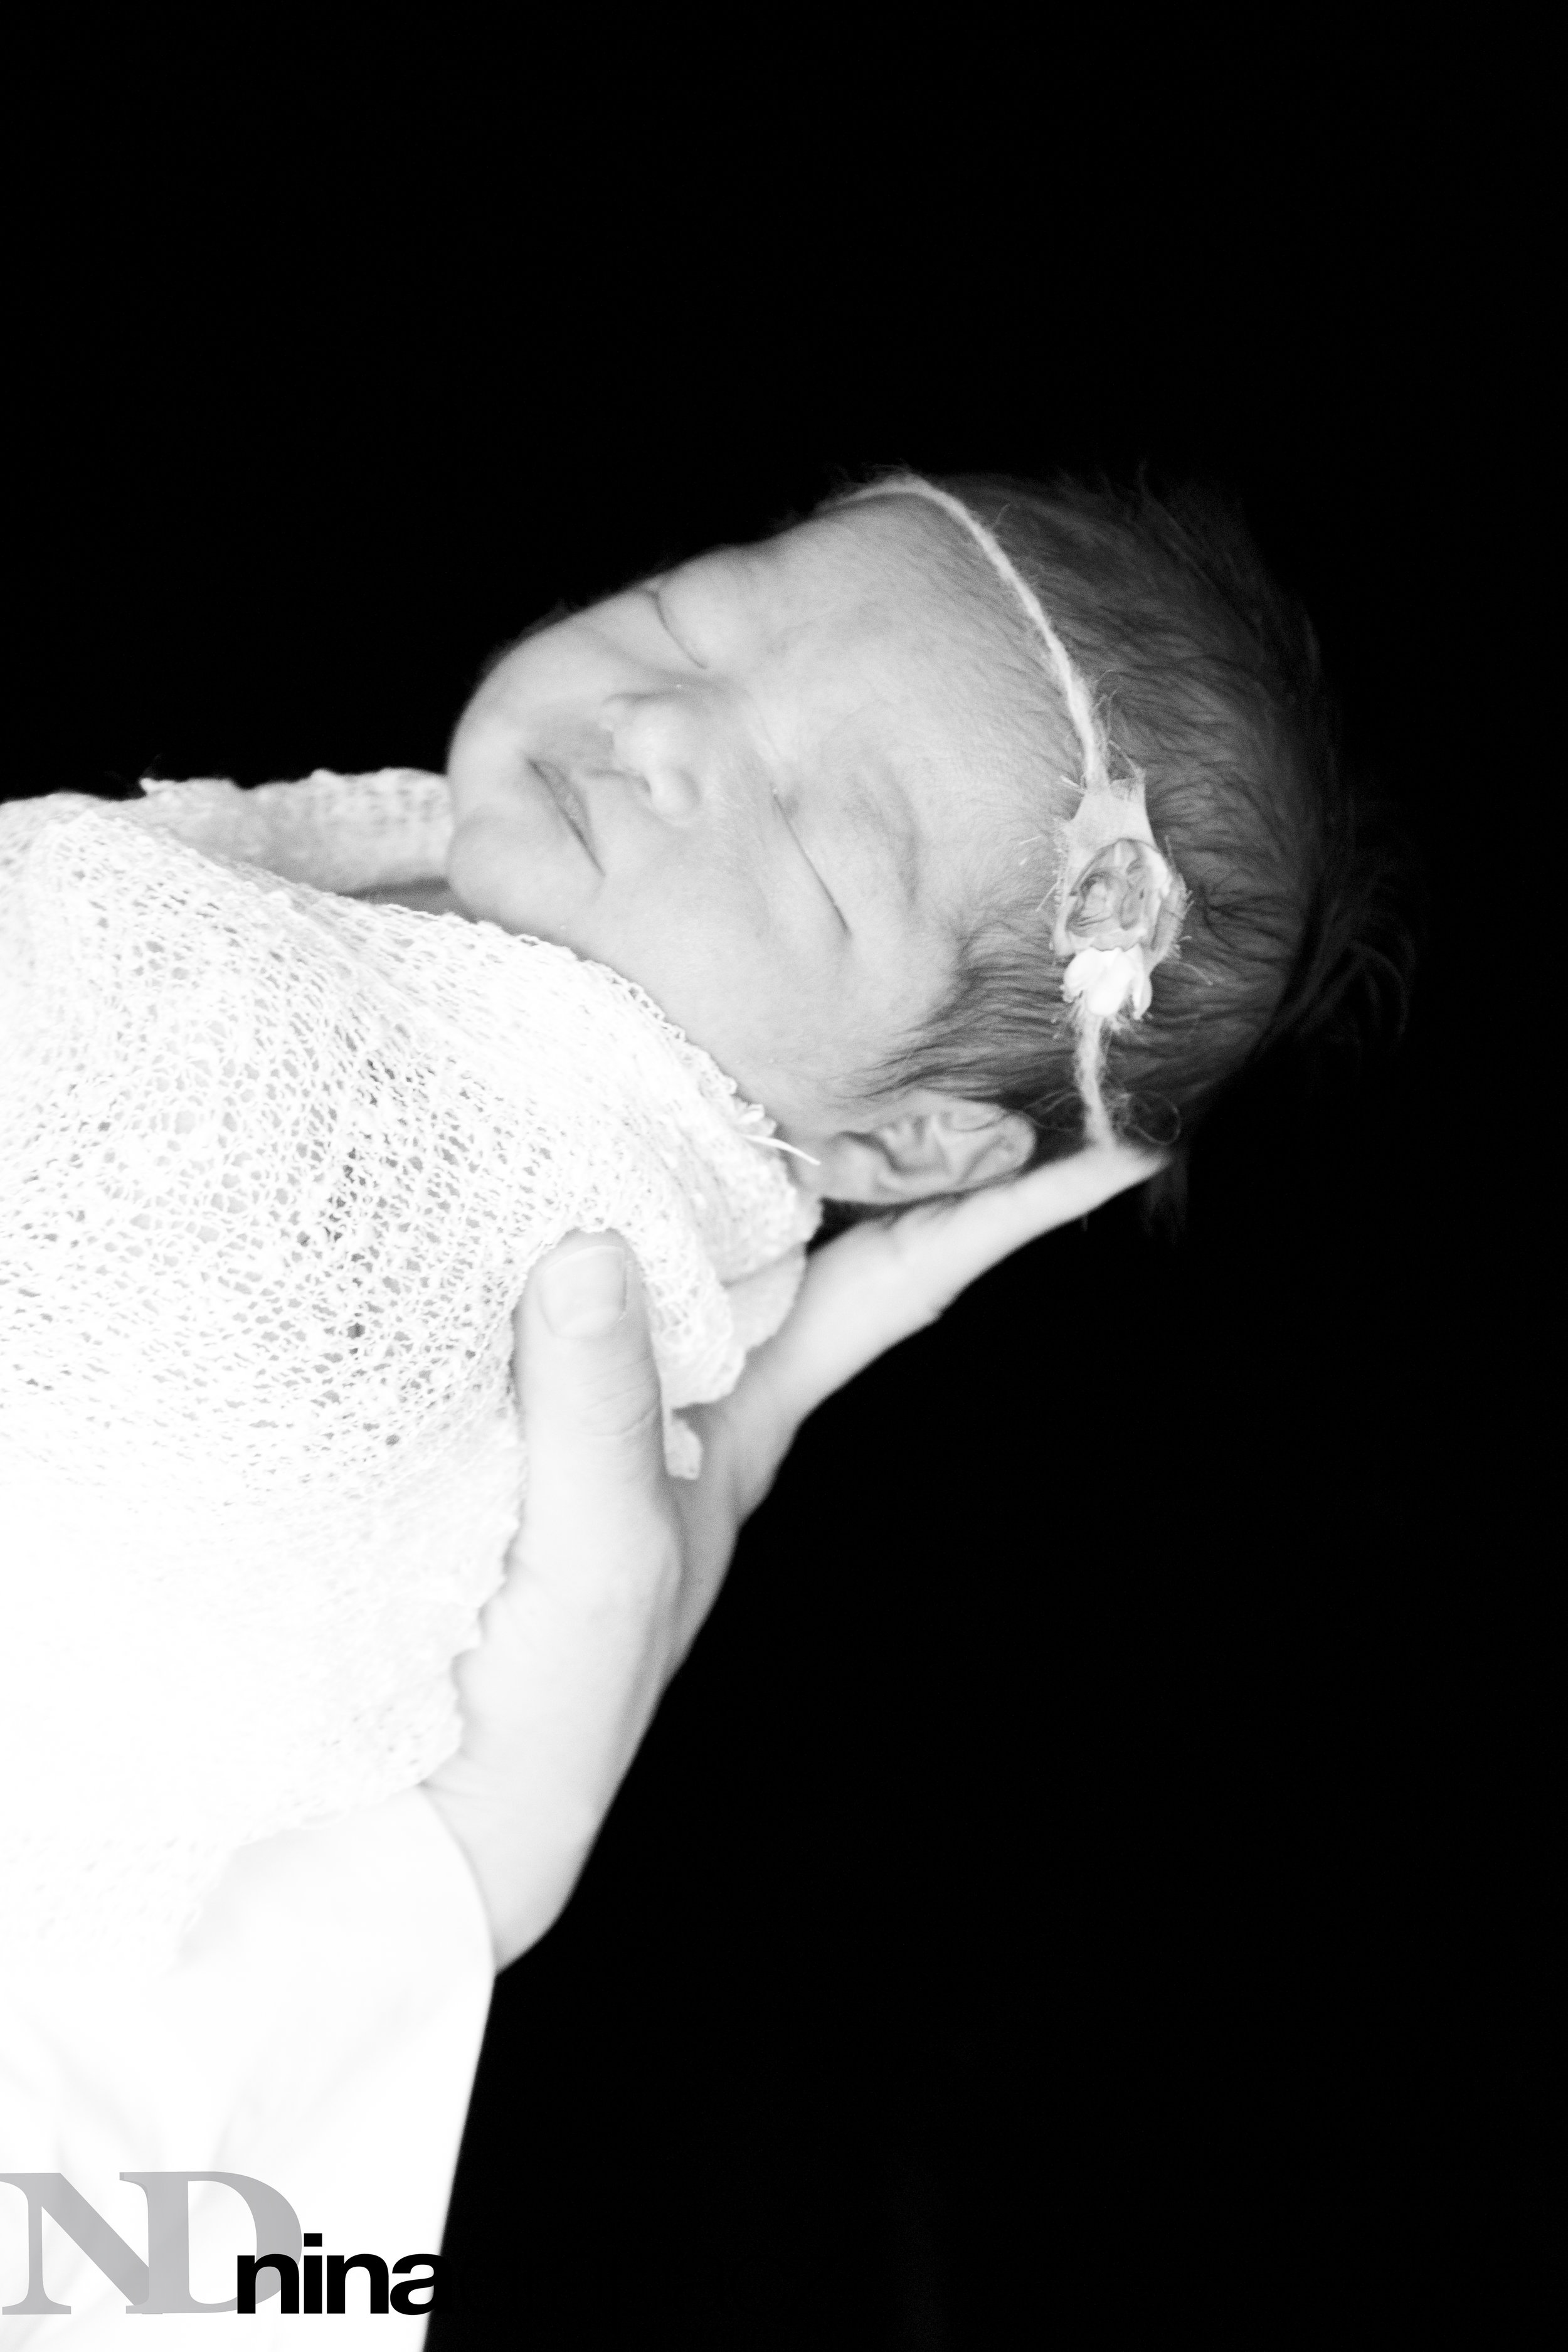 newborngirl.jpg